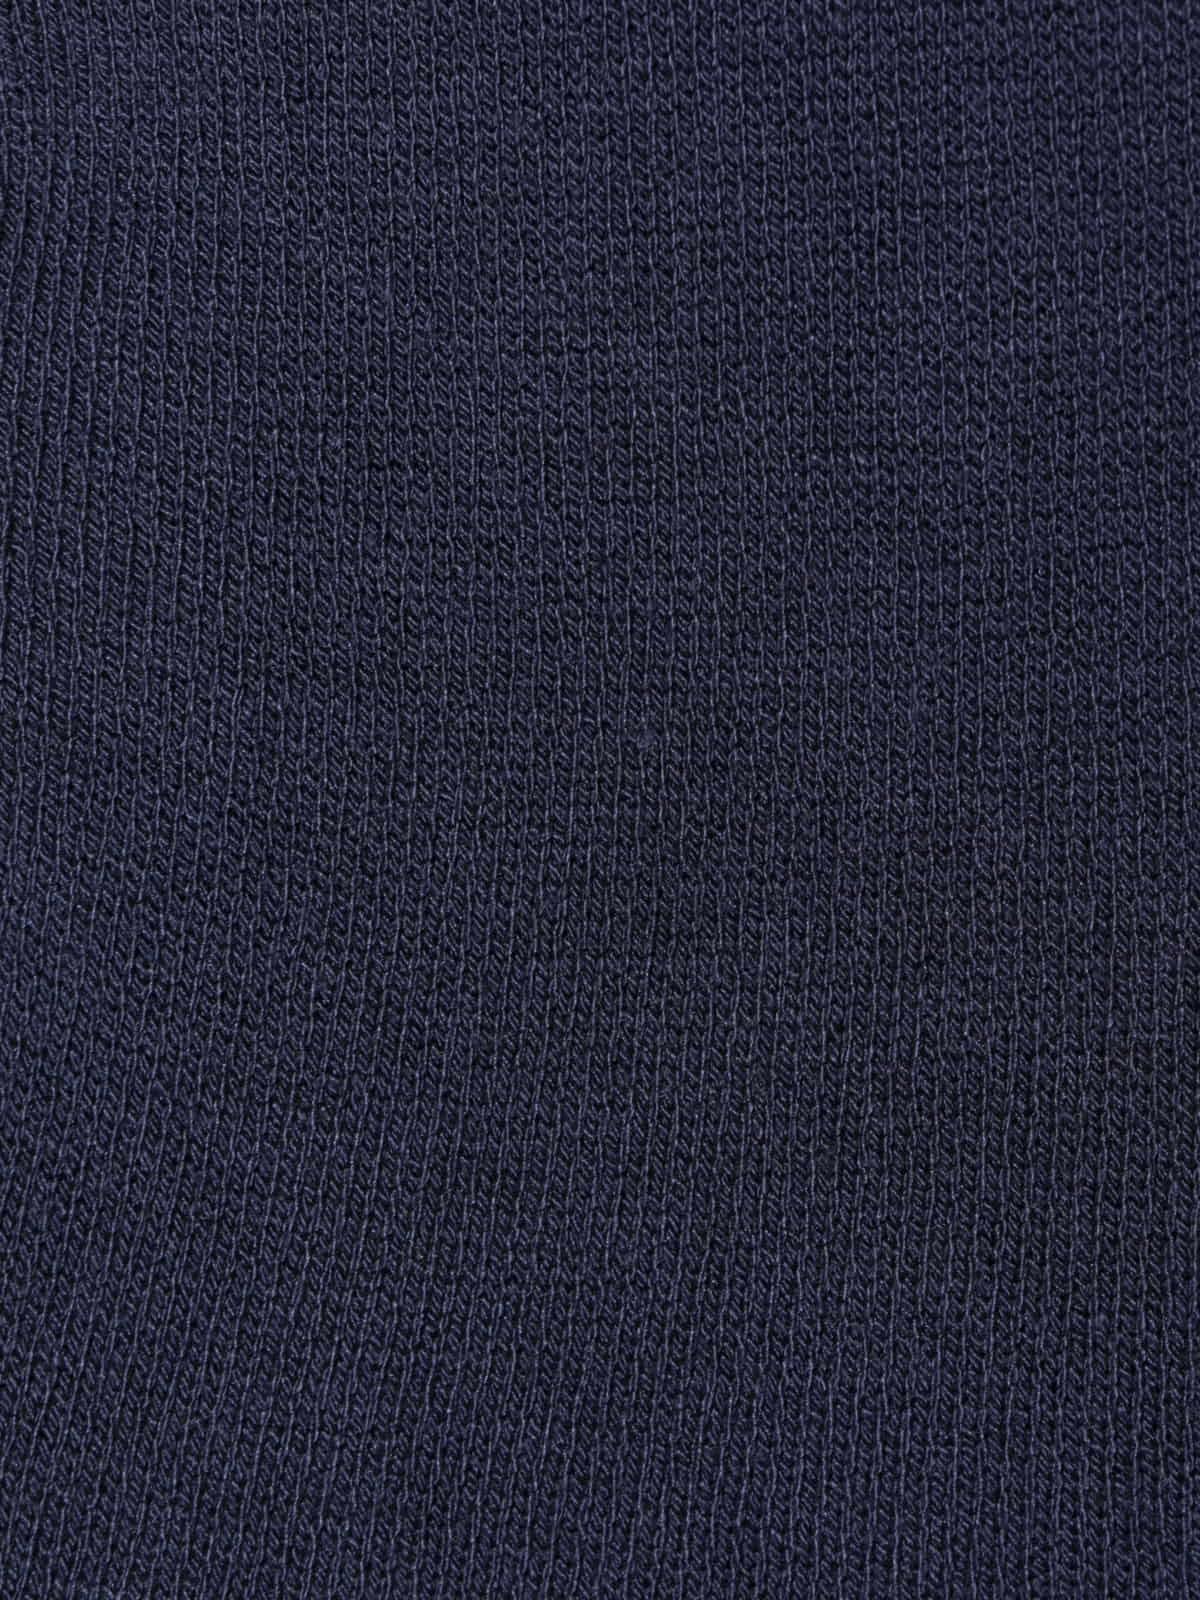 Jersey de mujer suelto Azul Marino